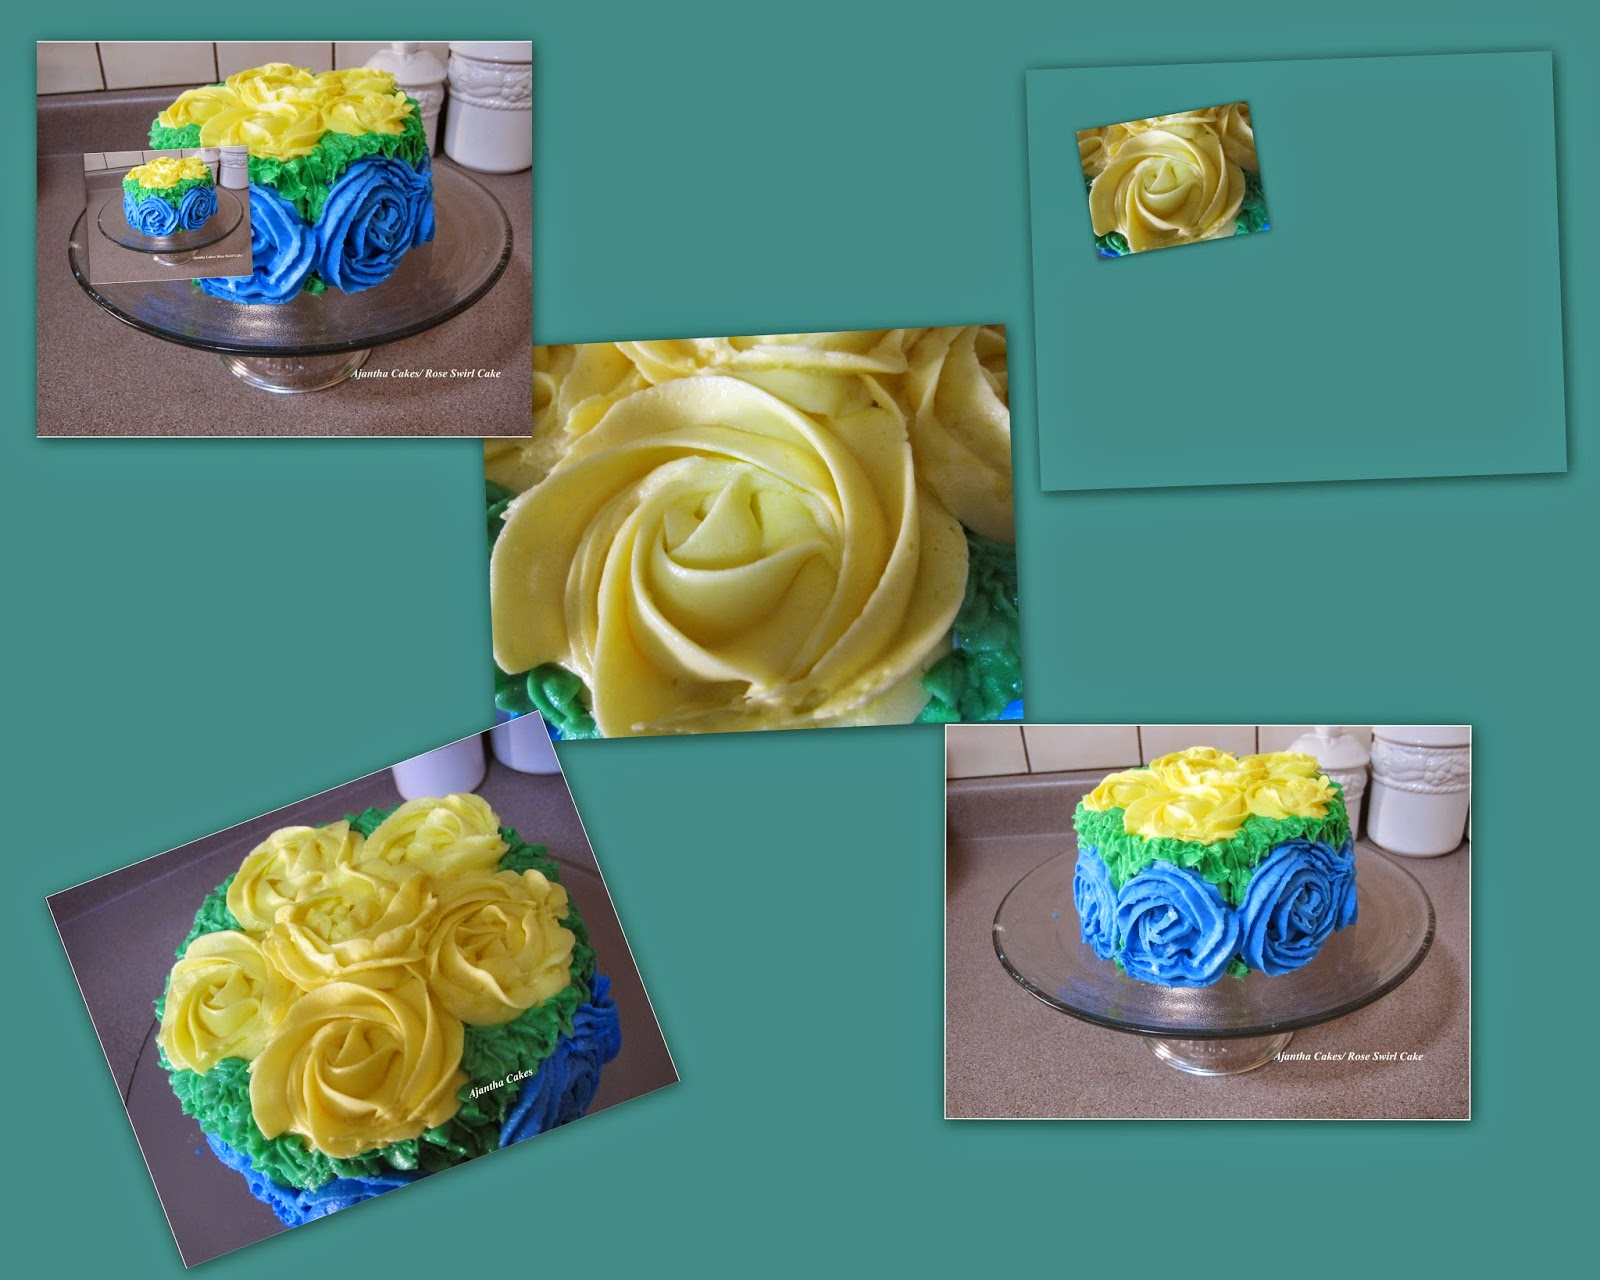 Ajantha Cakes/Rose Swirl Cake